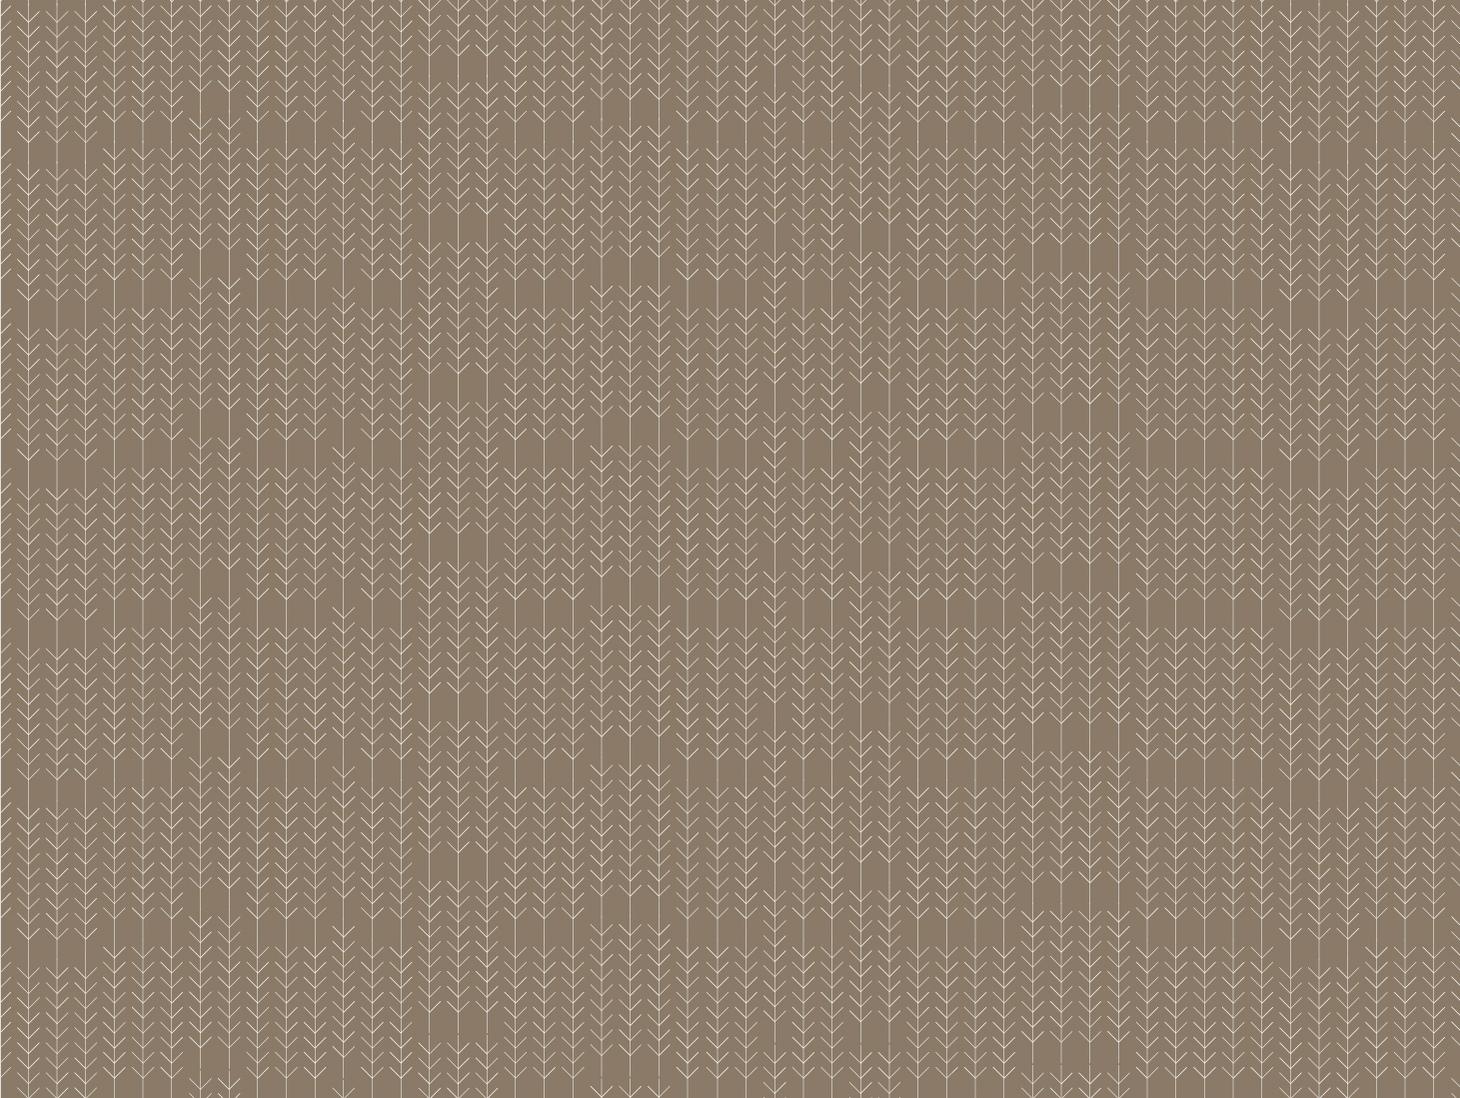 Narada_Pattern_01.jpg